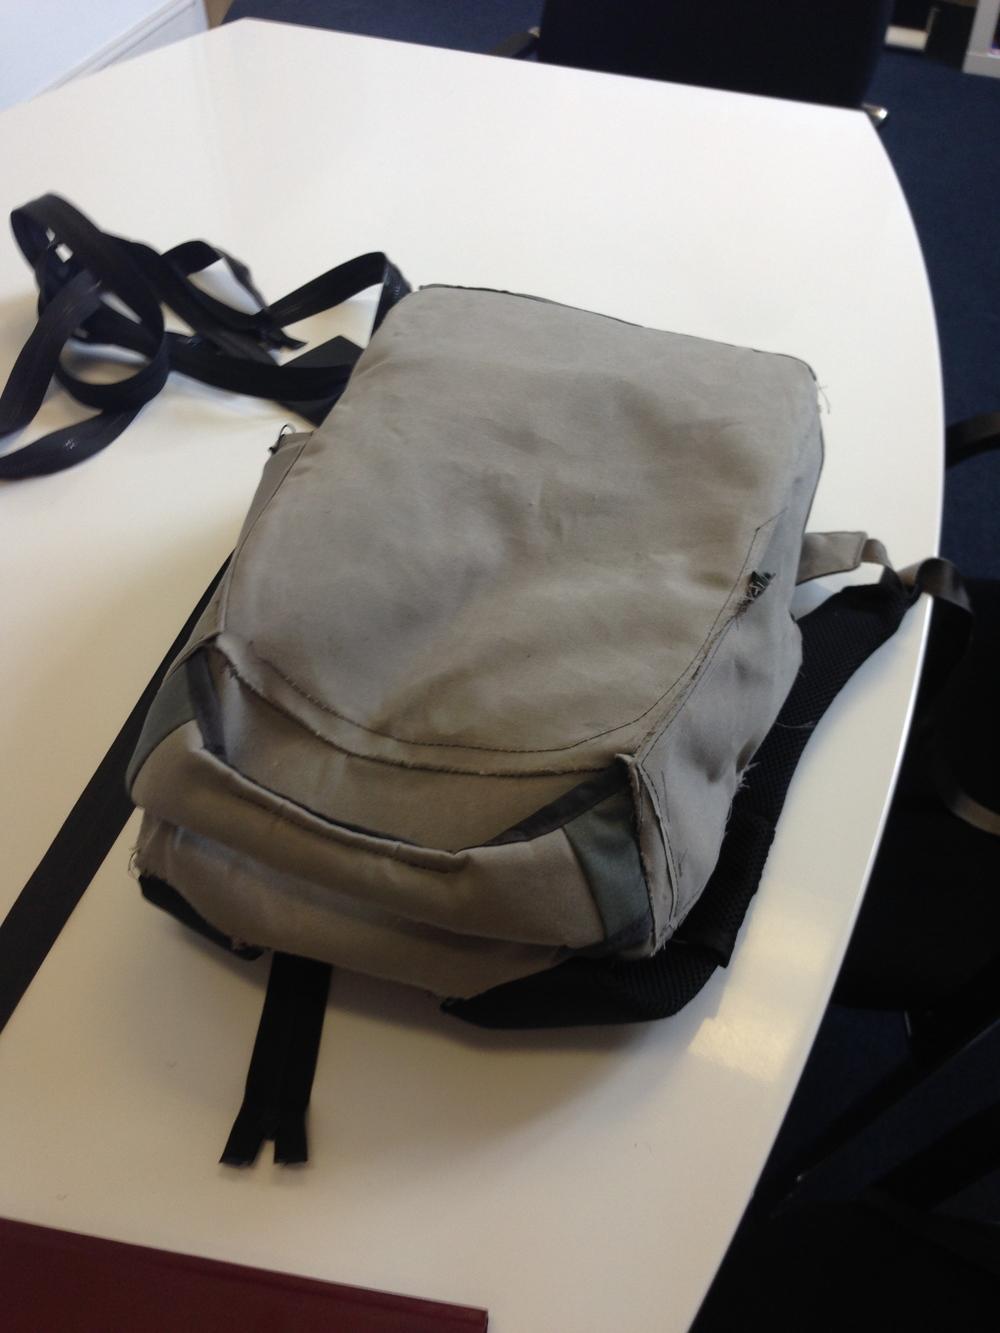 RiutBag prototype 1.2